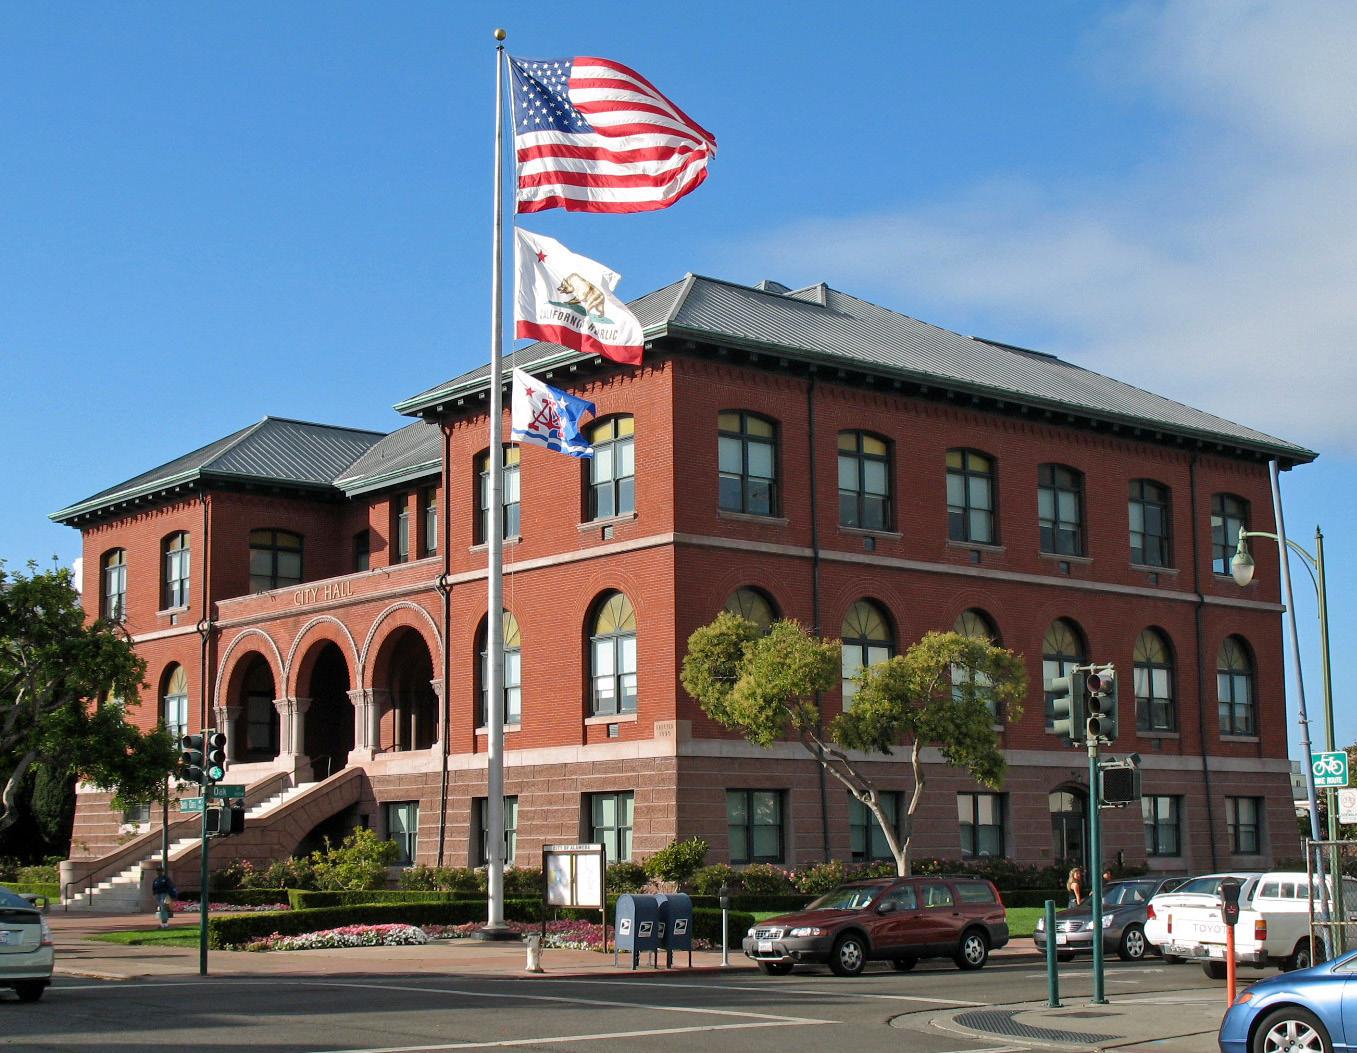 Salinas Breaking News The Salinas Sun Offers the Latest News in Salinas, California